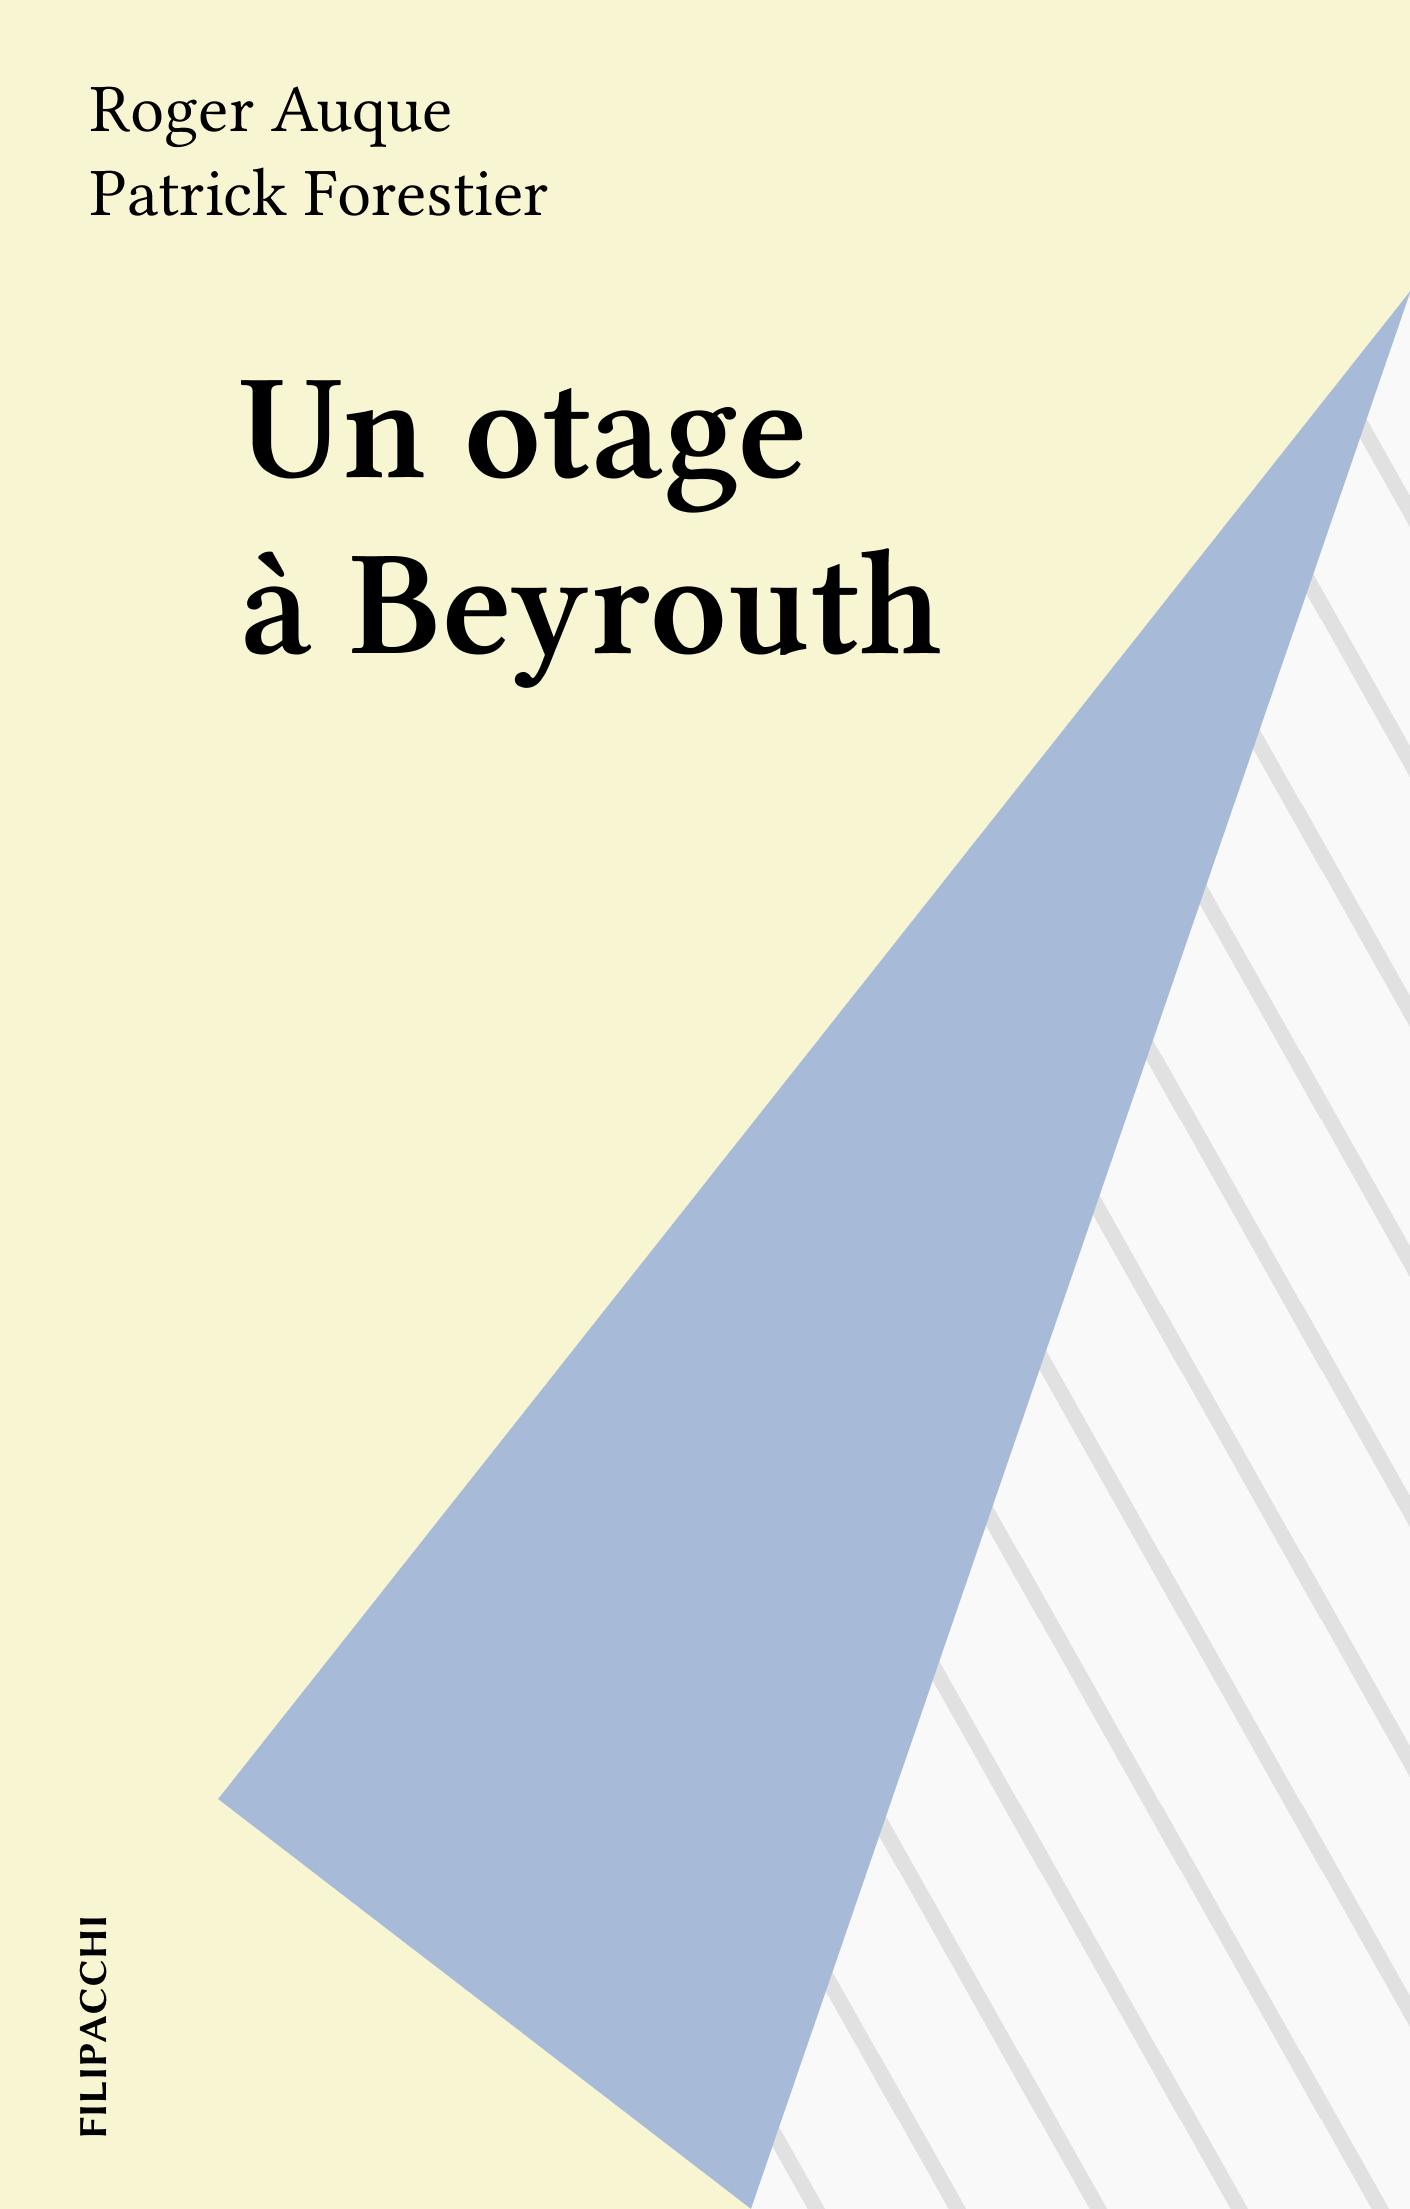 Un otage à Beyrouth